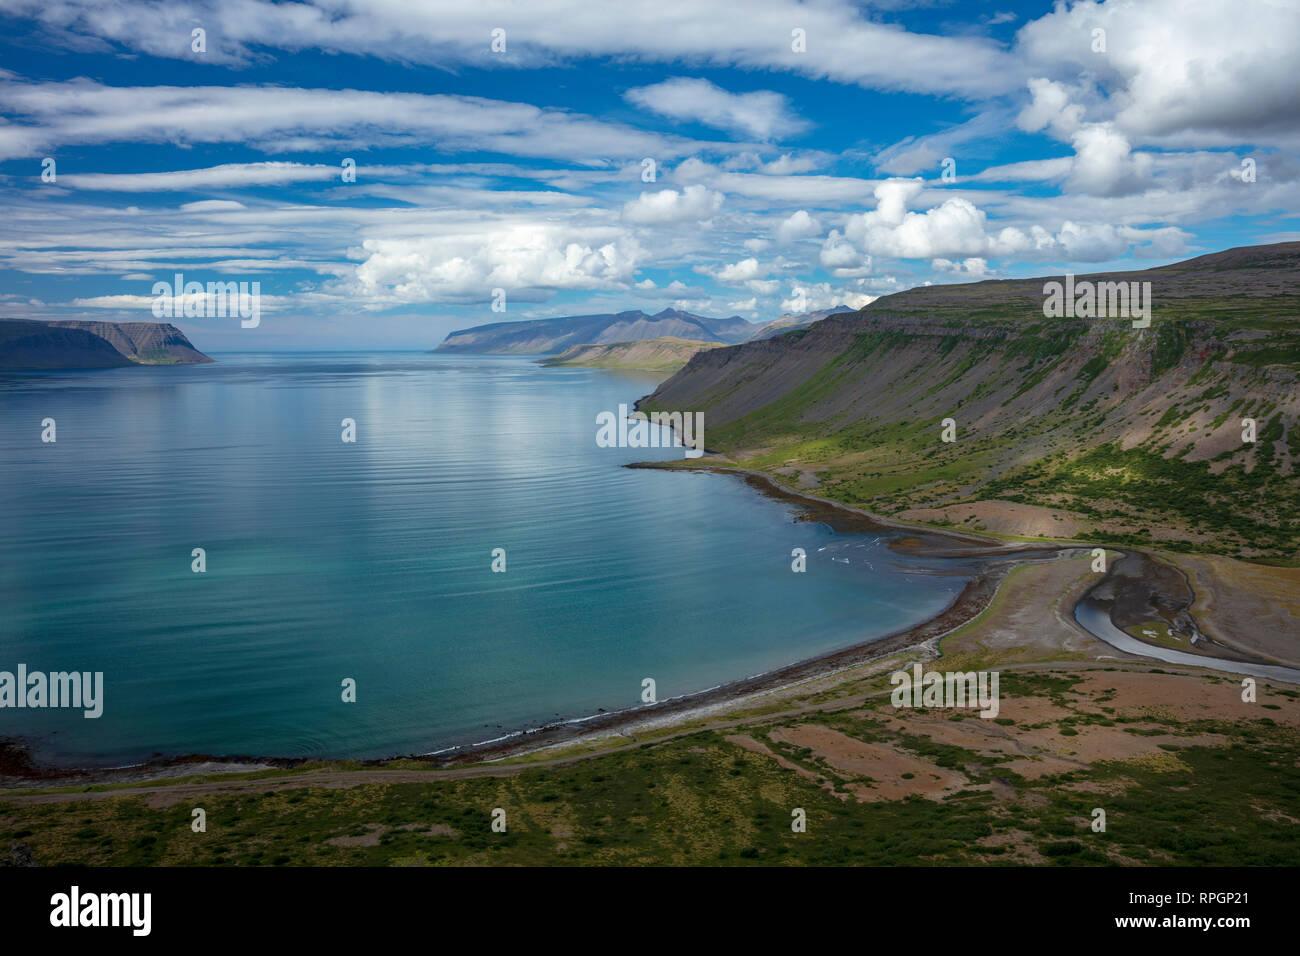 Vue sur le fjord de Arnarfjordur Nordfjall. Westfjords, Islande. Photo Stock